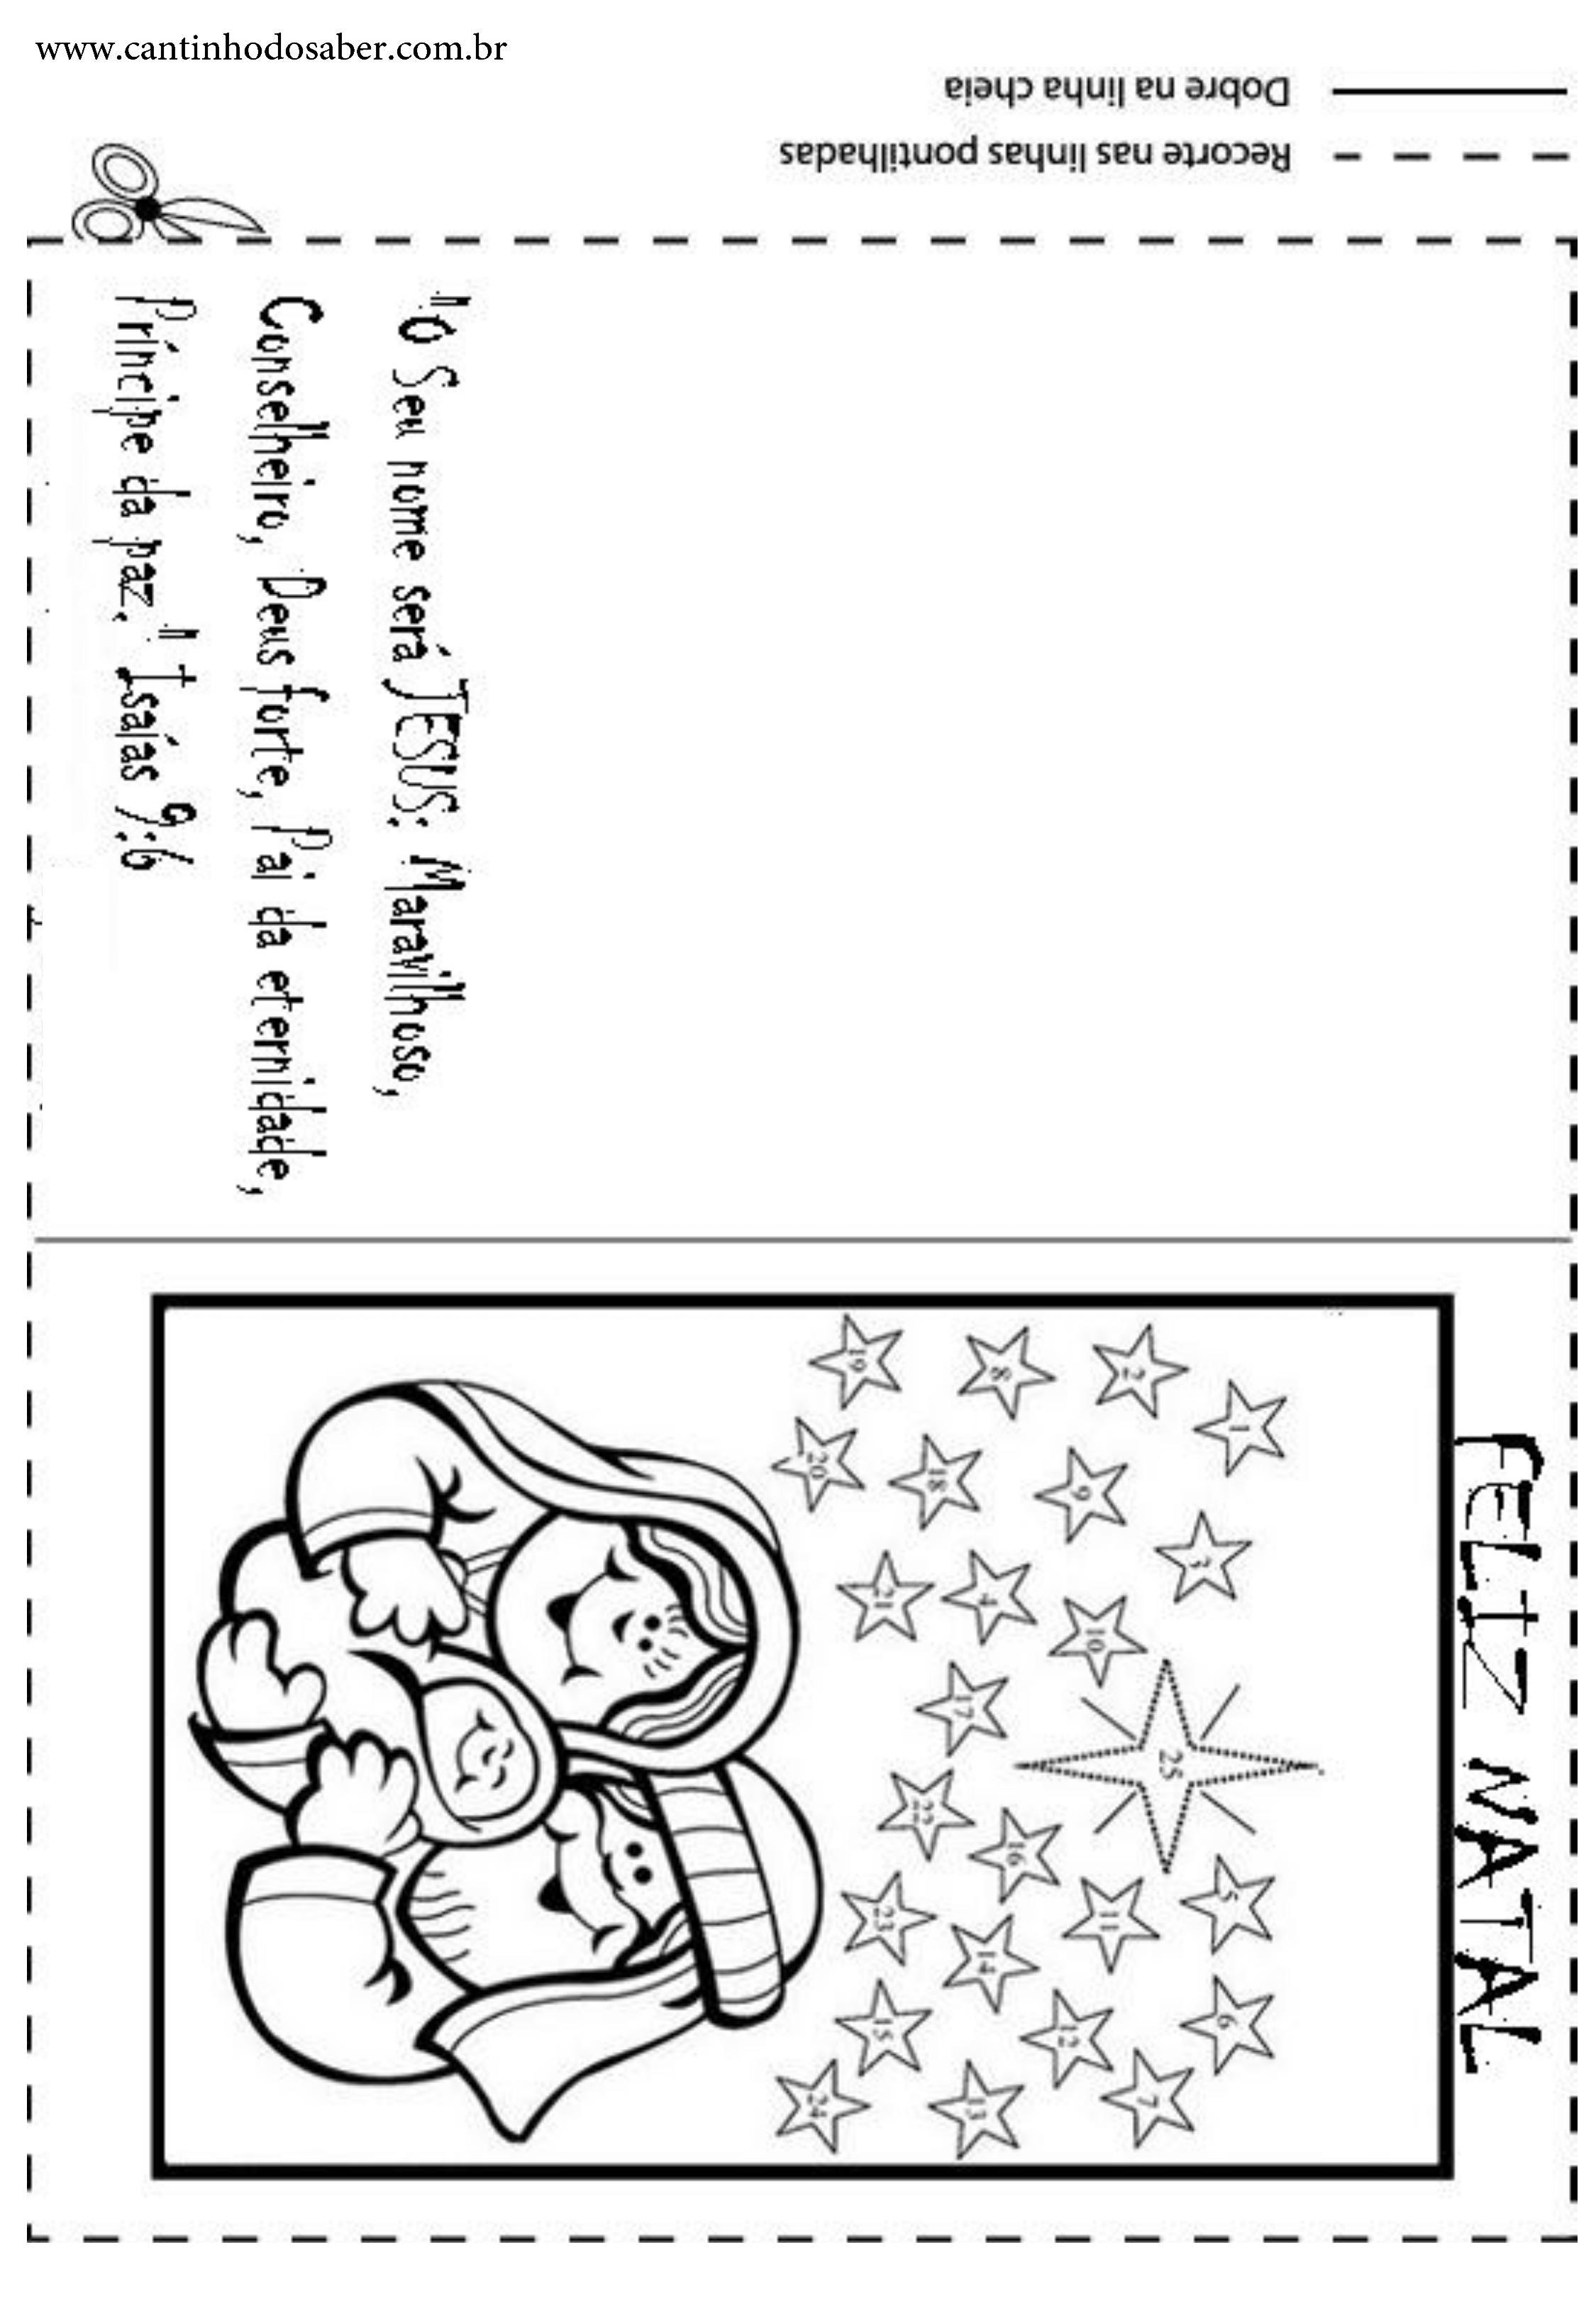 Well-known cartas de natal para imprimir - Neuer.monoberlin.co BG06